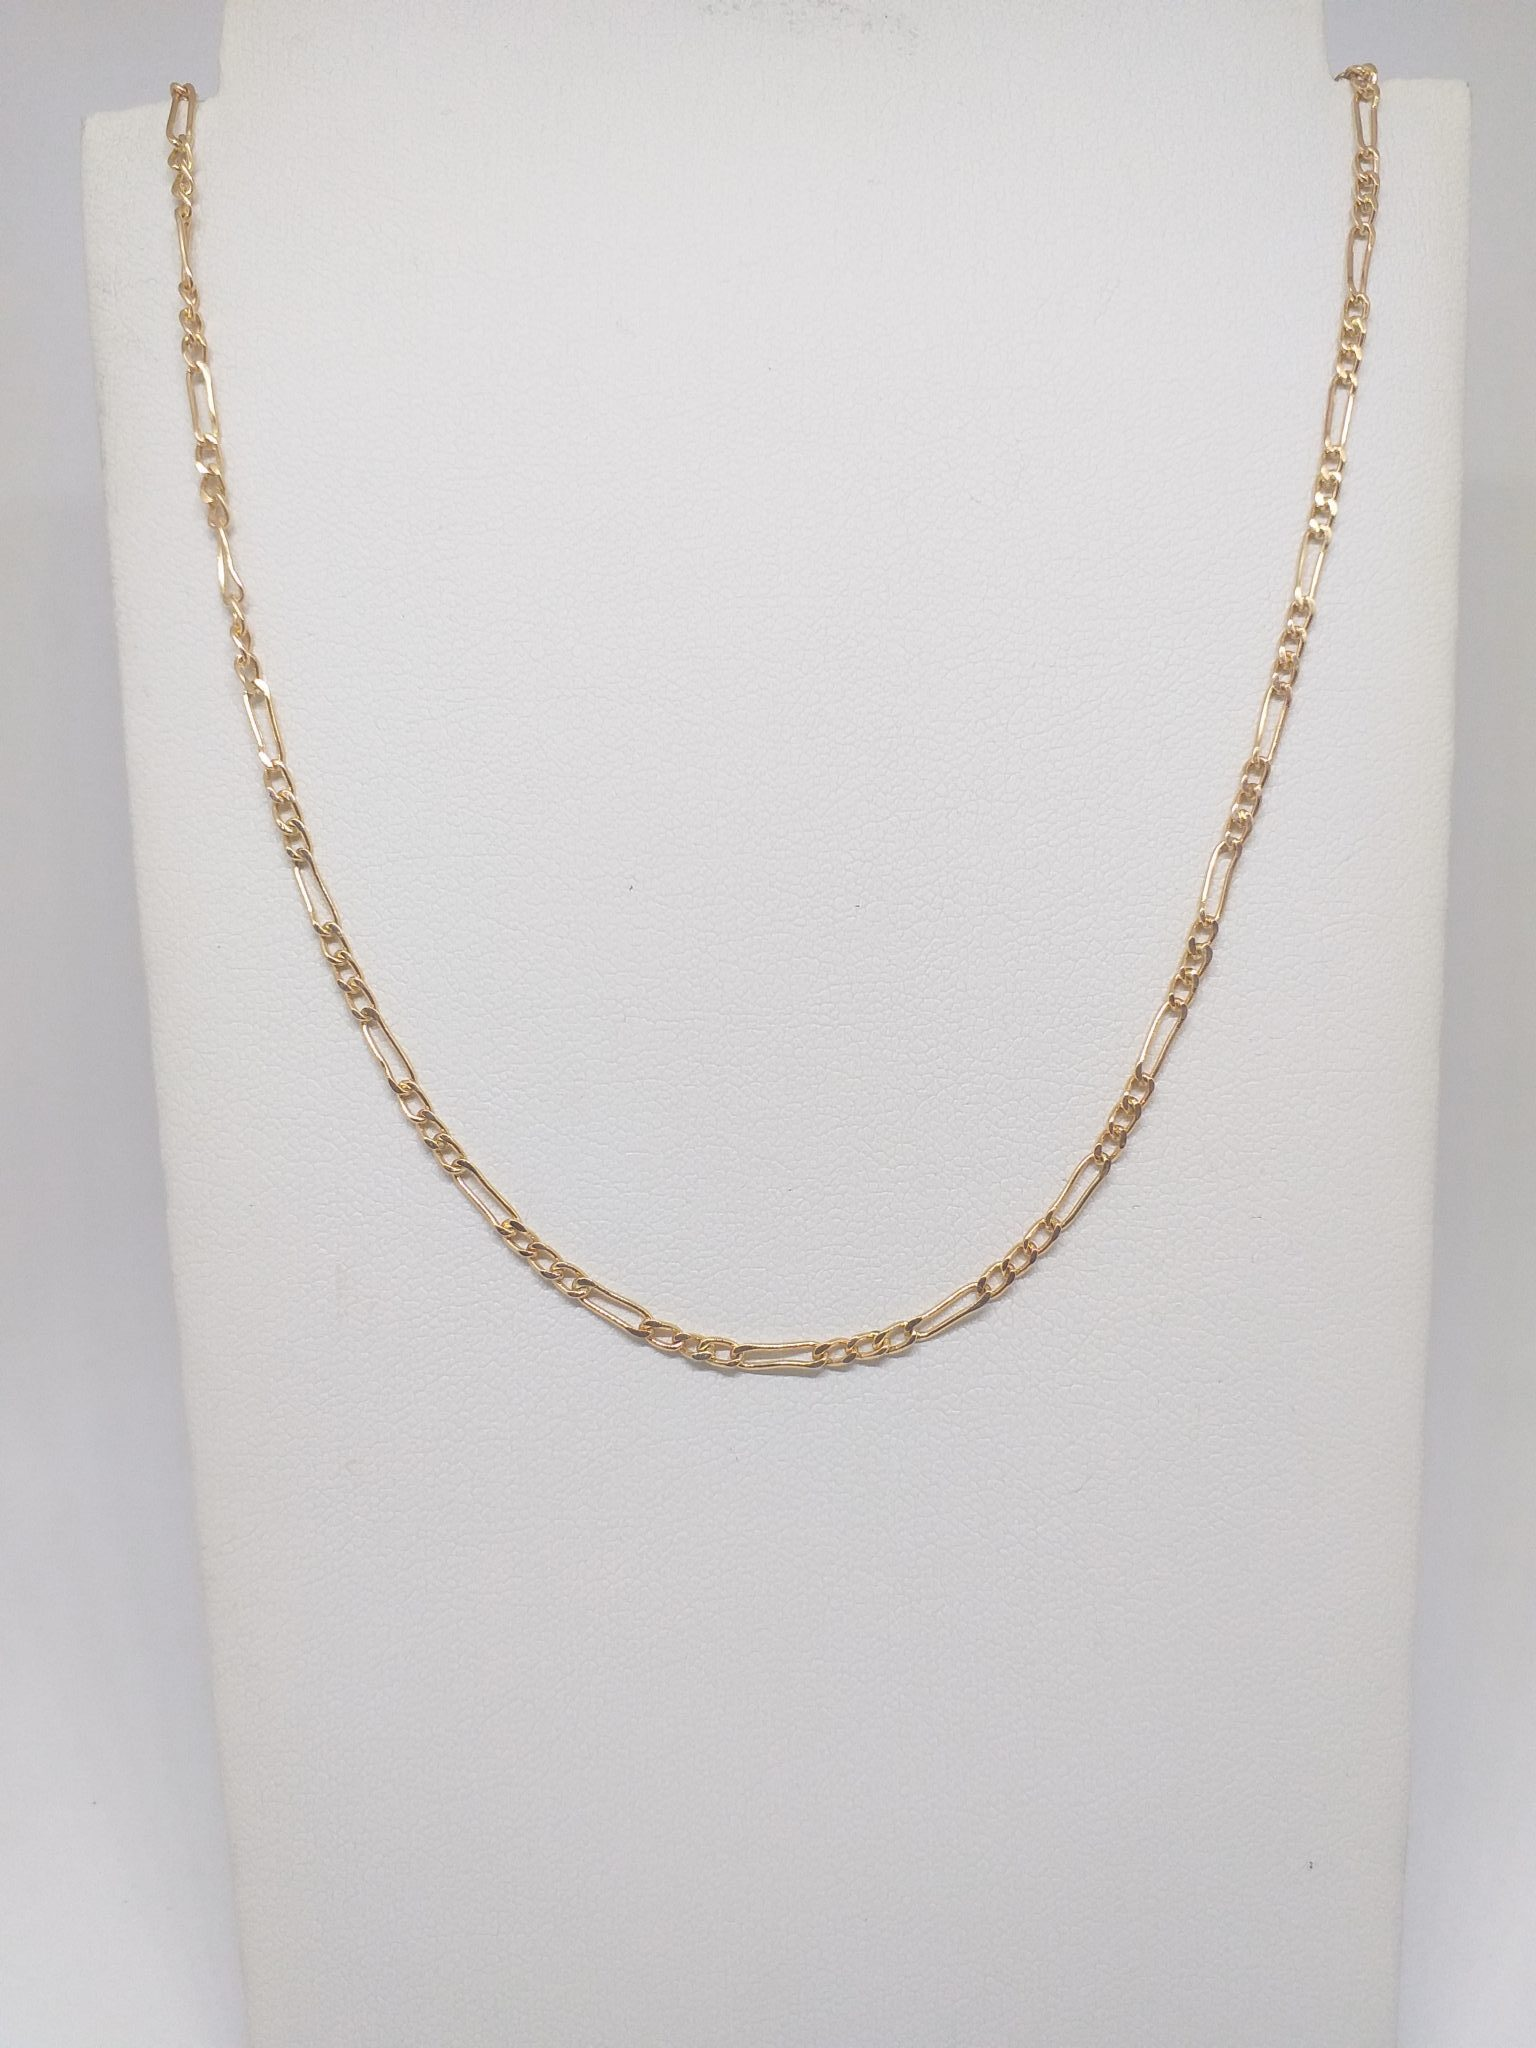 Cadena Cartier De Oro 18k Joyas Lillo